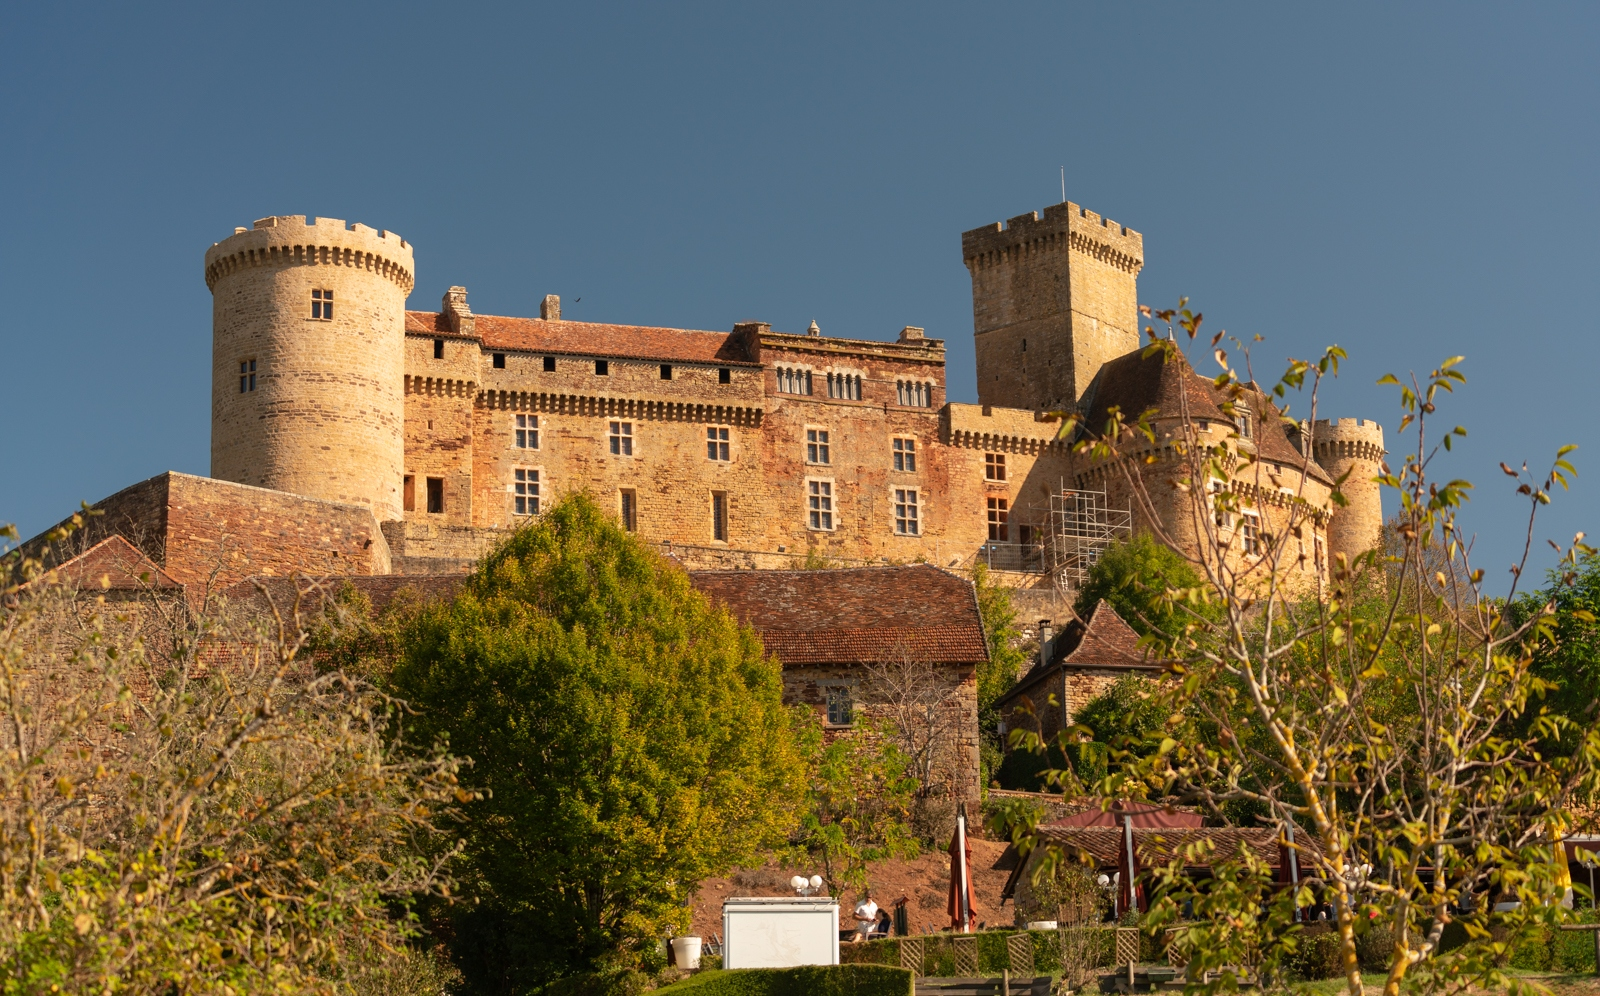 Castelnau-Bretenoux